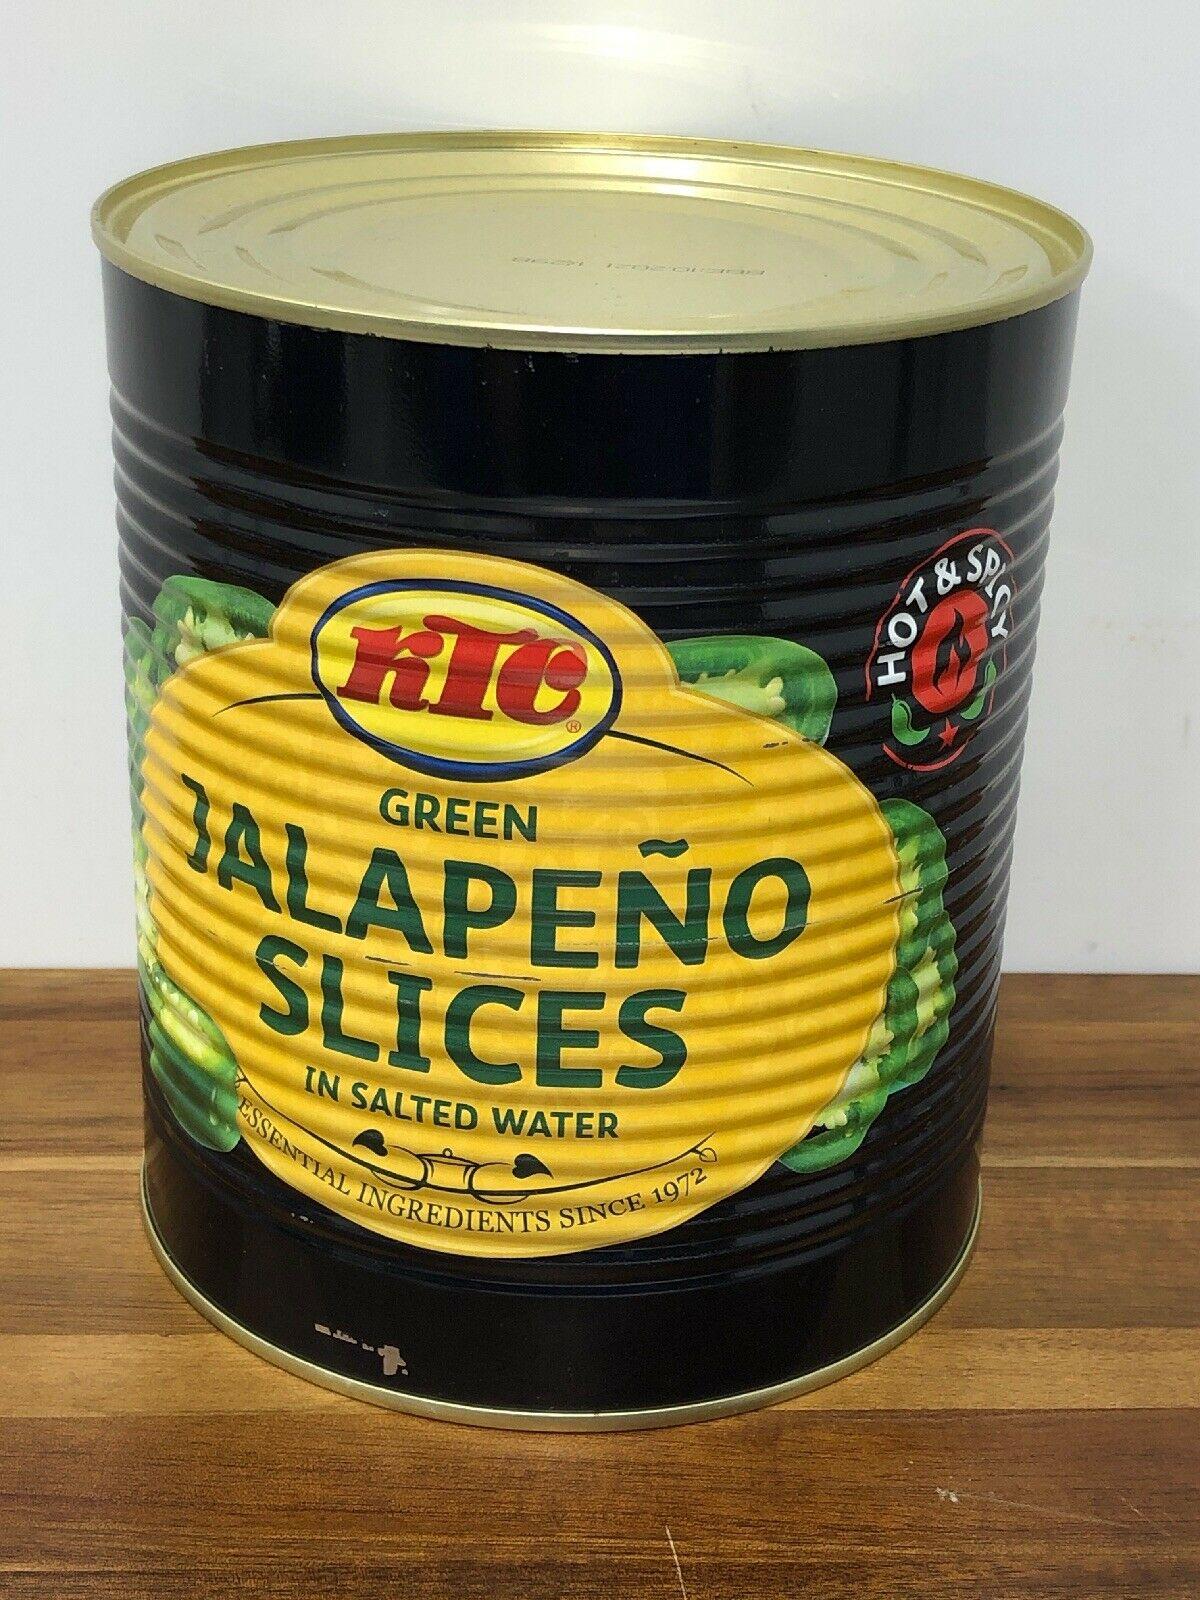 Giant 2.9kg can of KTC Sliced Jalapenos - 97p instore @ Costco Farnborough